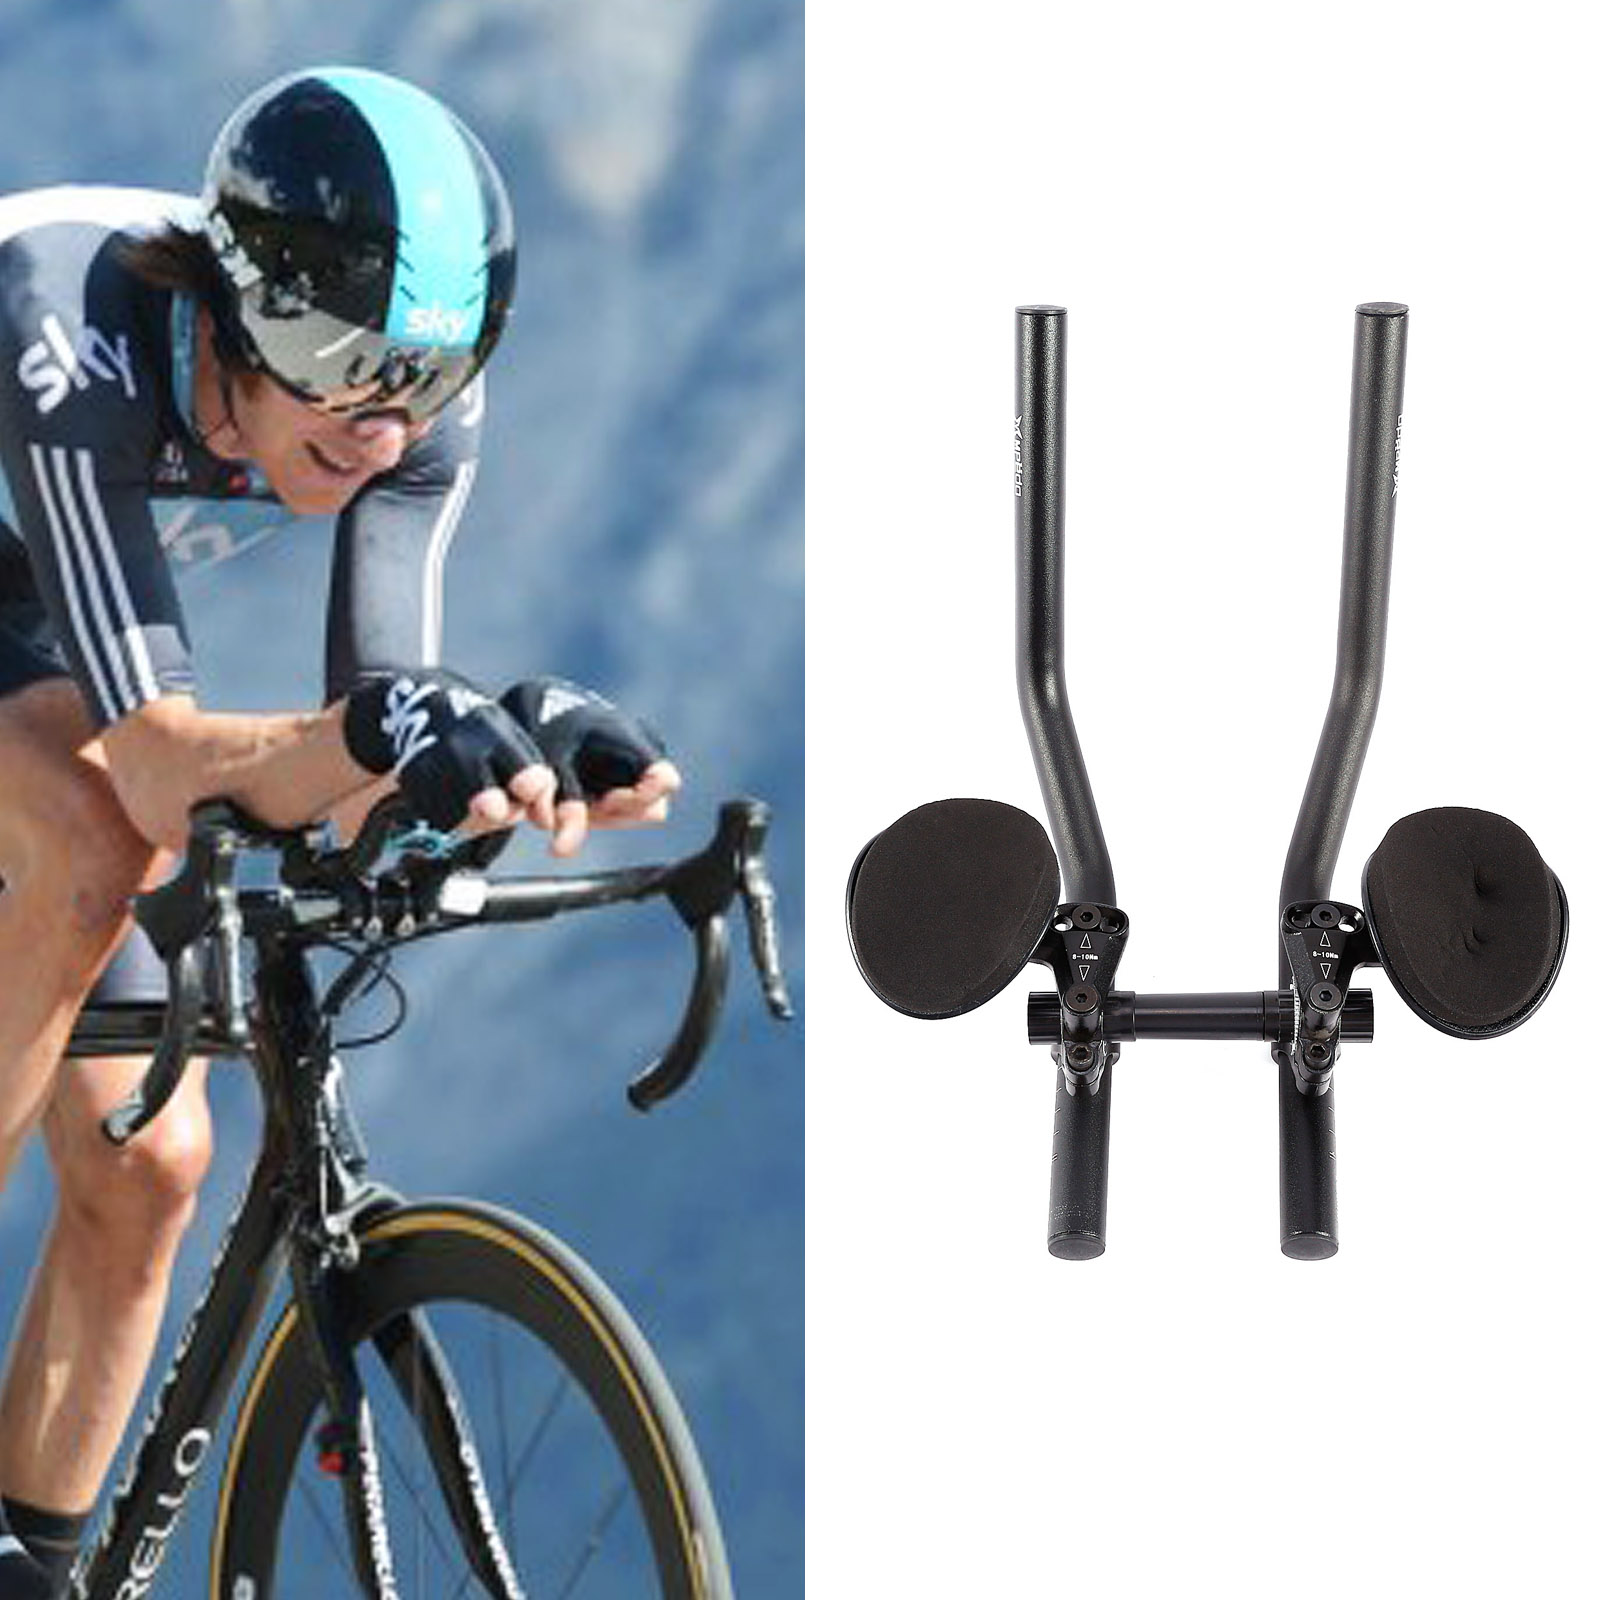 fahrrad triathlon lenker aufsatz triathlonaufsatz system. Black Bedroom Furniture Sets. Home Design Ideas